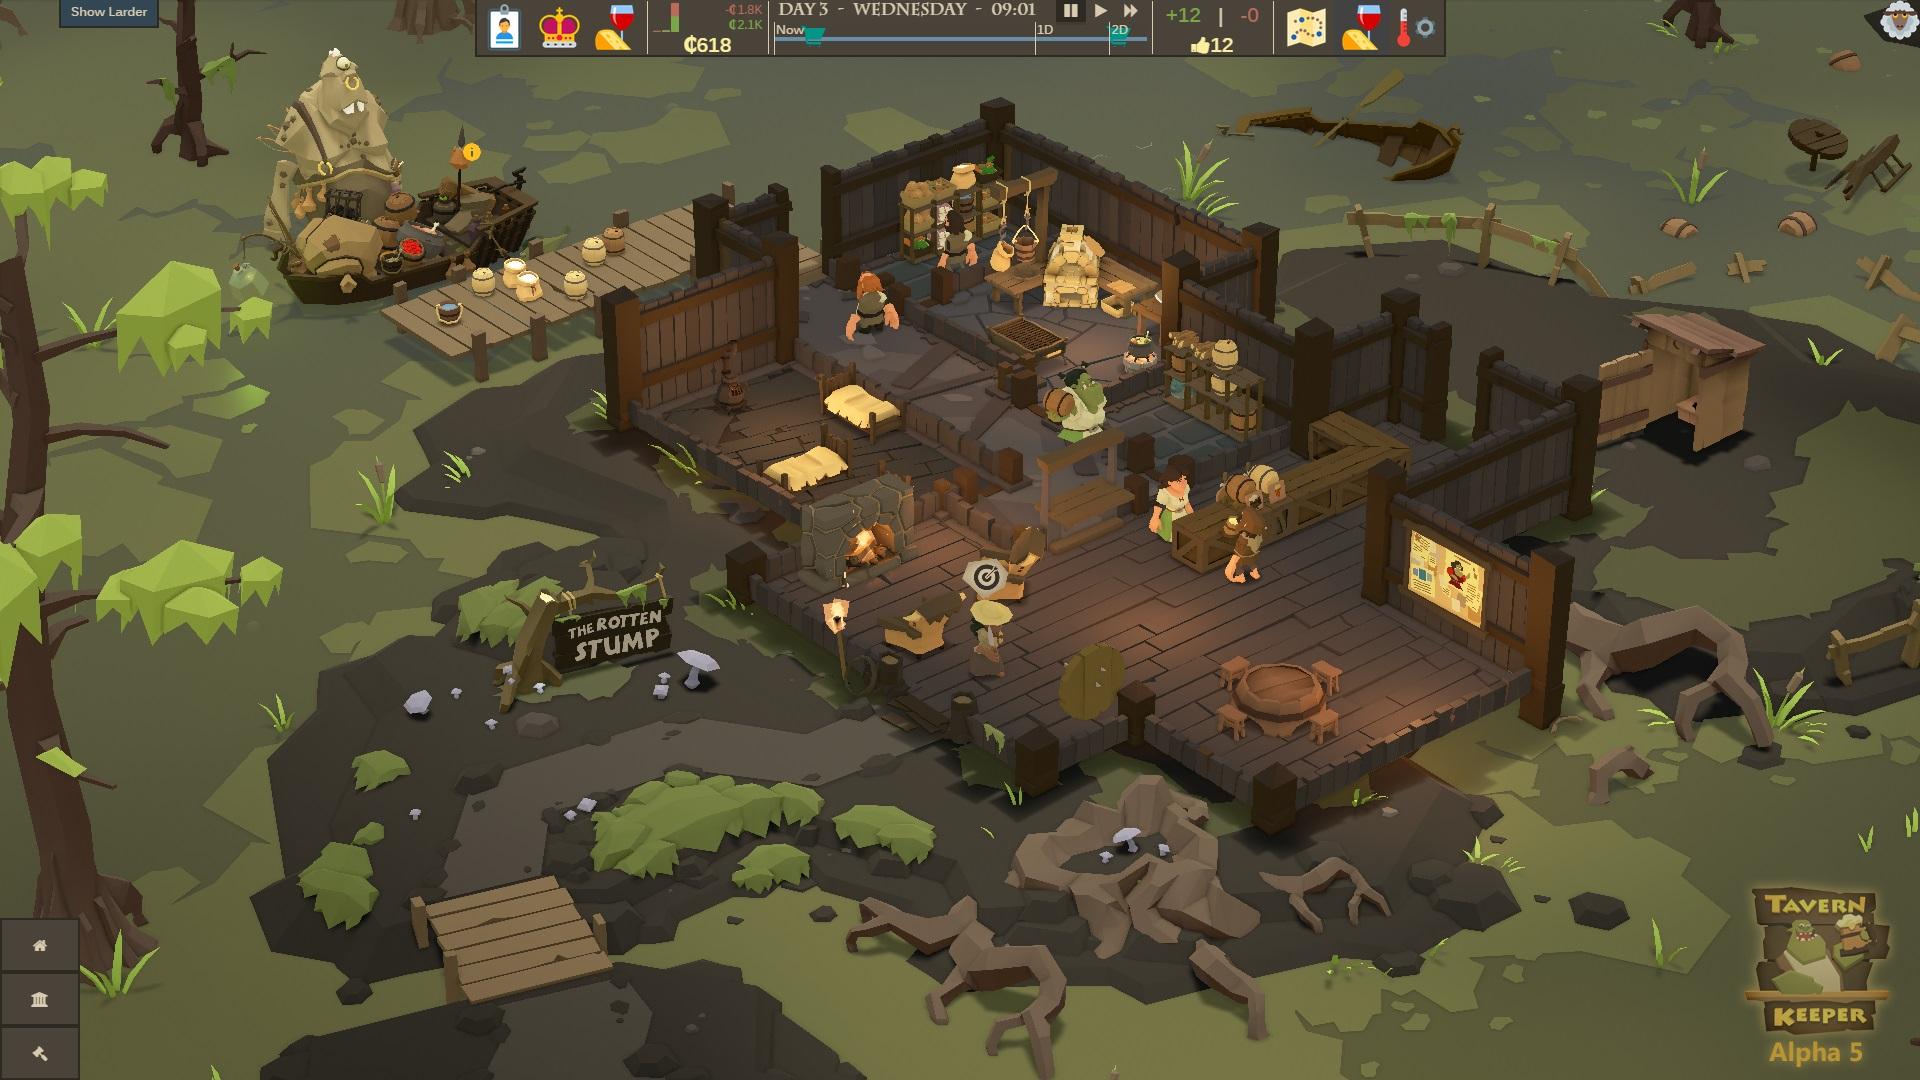 Tavern Keeper screenshot